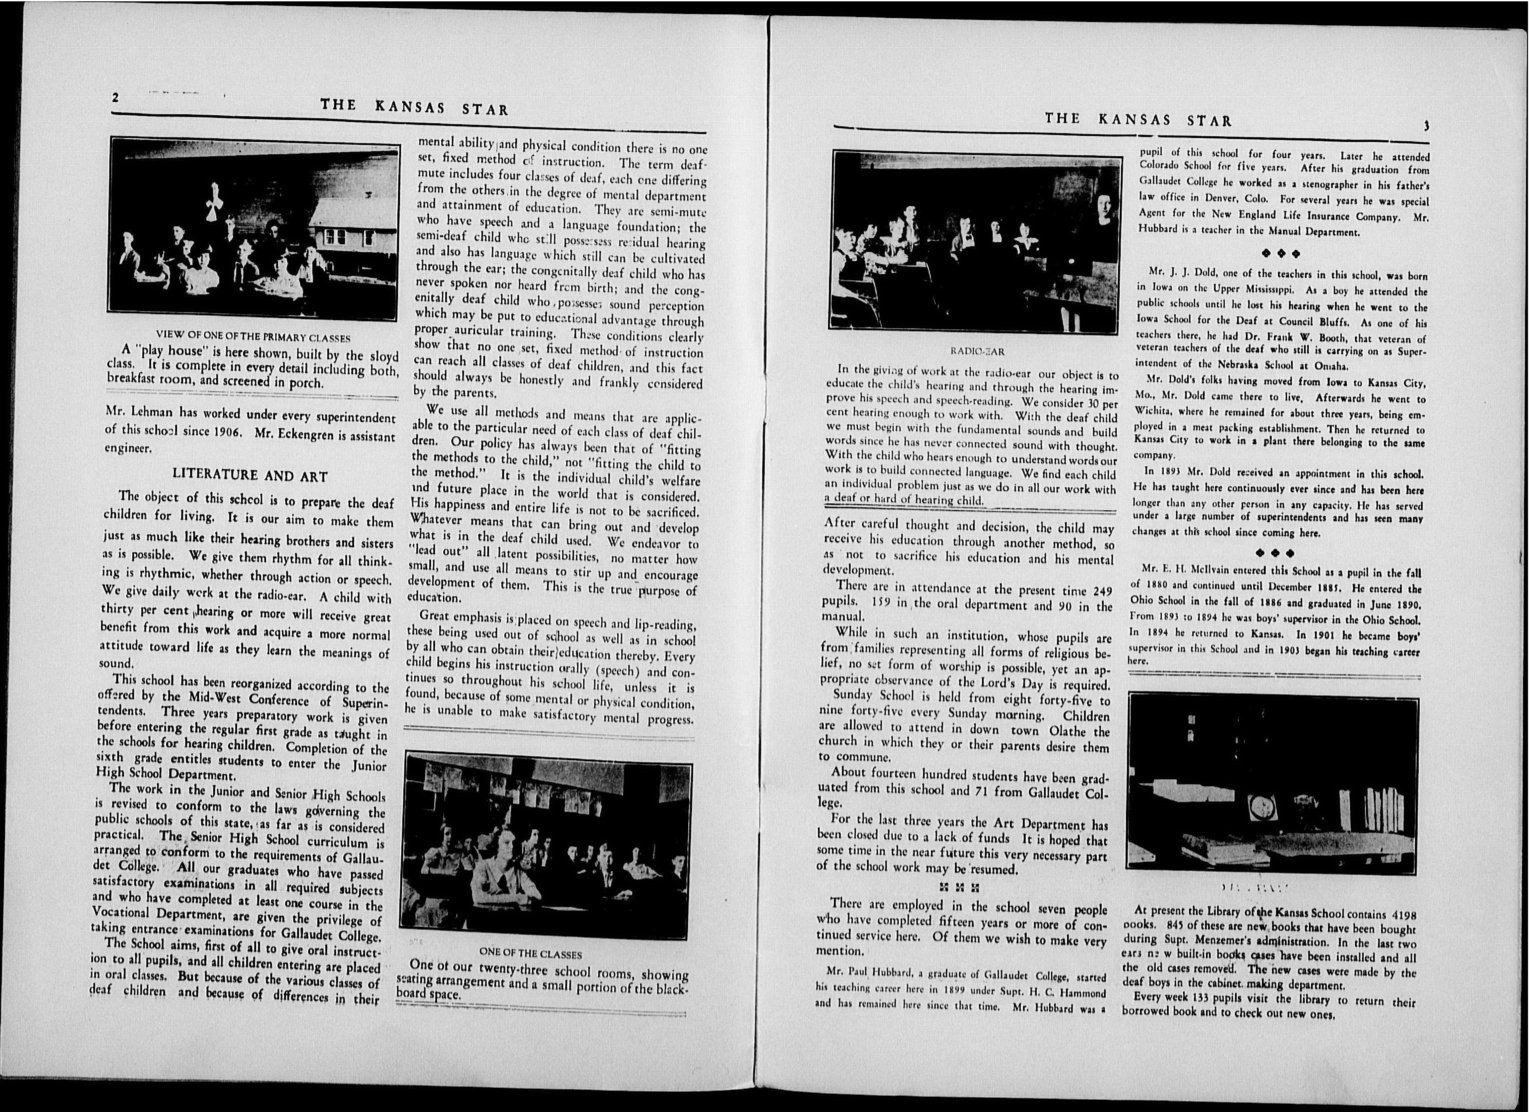 The Kansas Star, volume 50, number 5 - 2-3